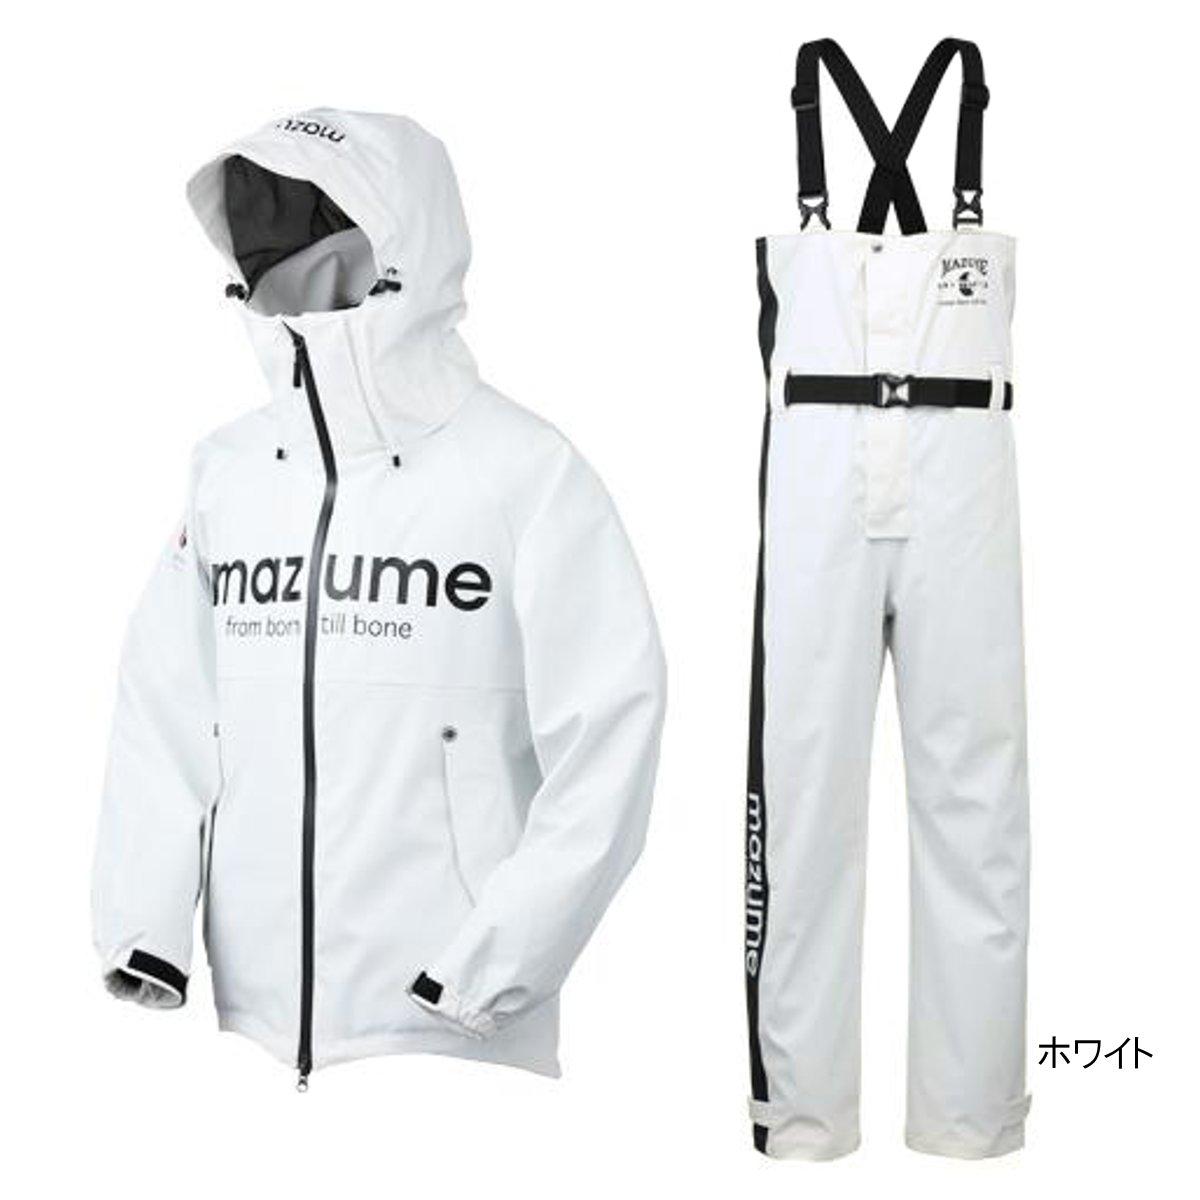 mazume ROUGH WATER レインスーツ II MZRS-383 L ホワイト【送料無料】